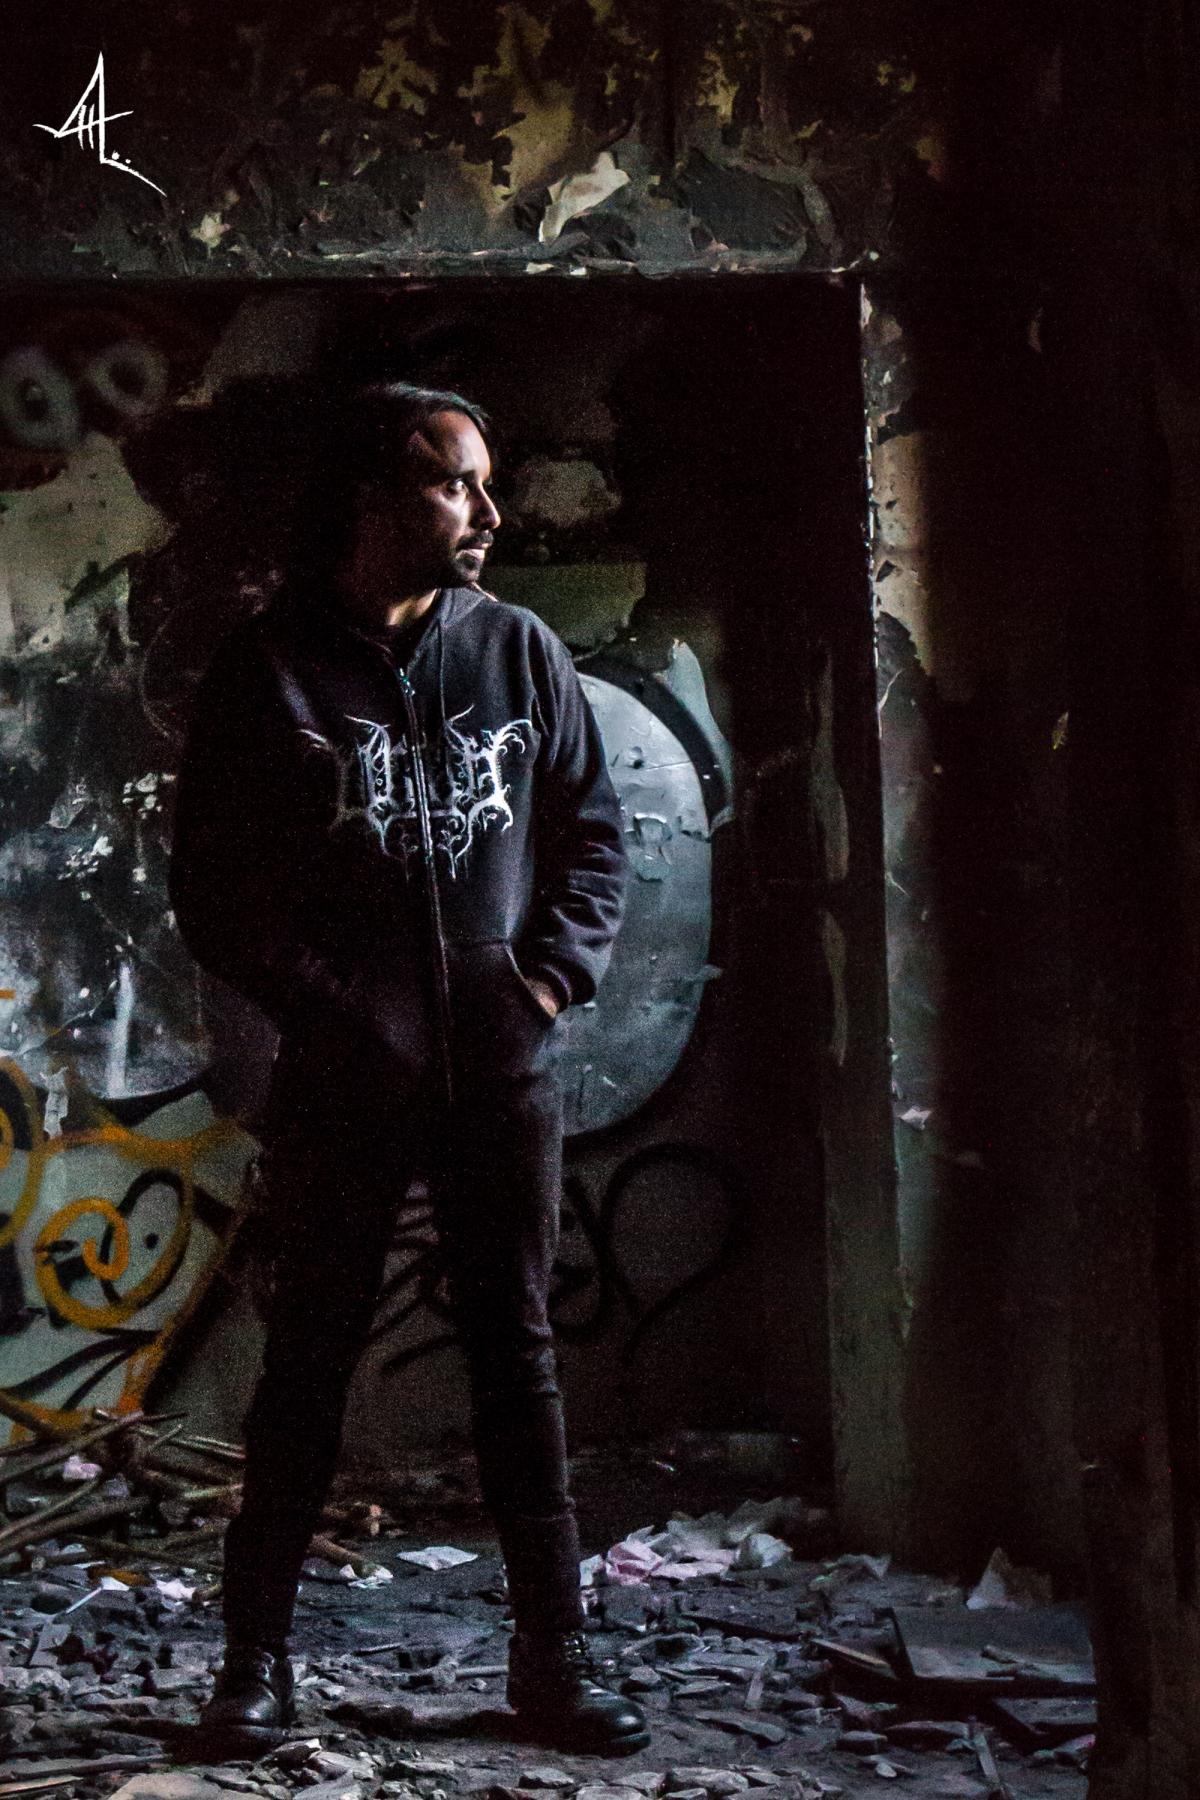 Record Label Interview – Gerald Milani of Les Acteurs de L'OmbreProductions